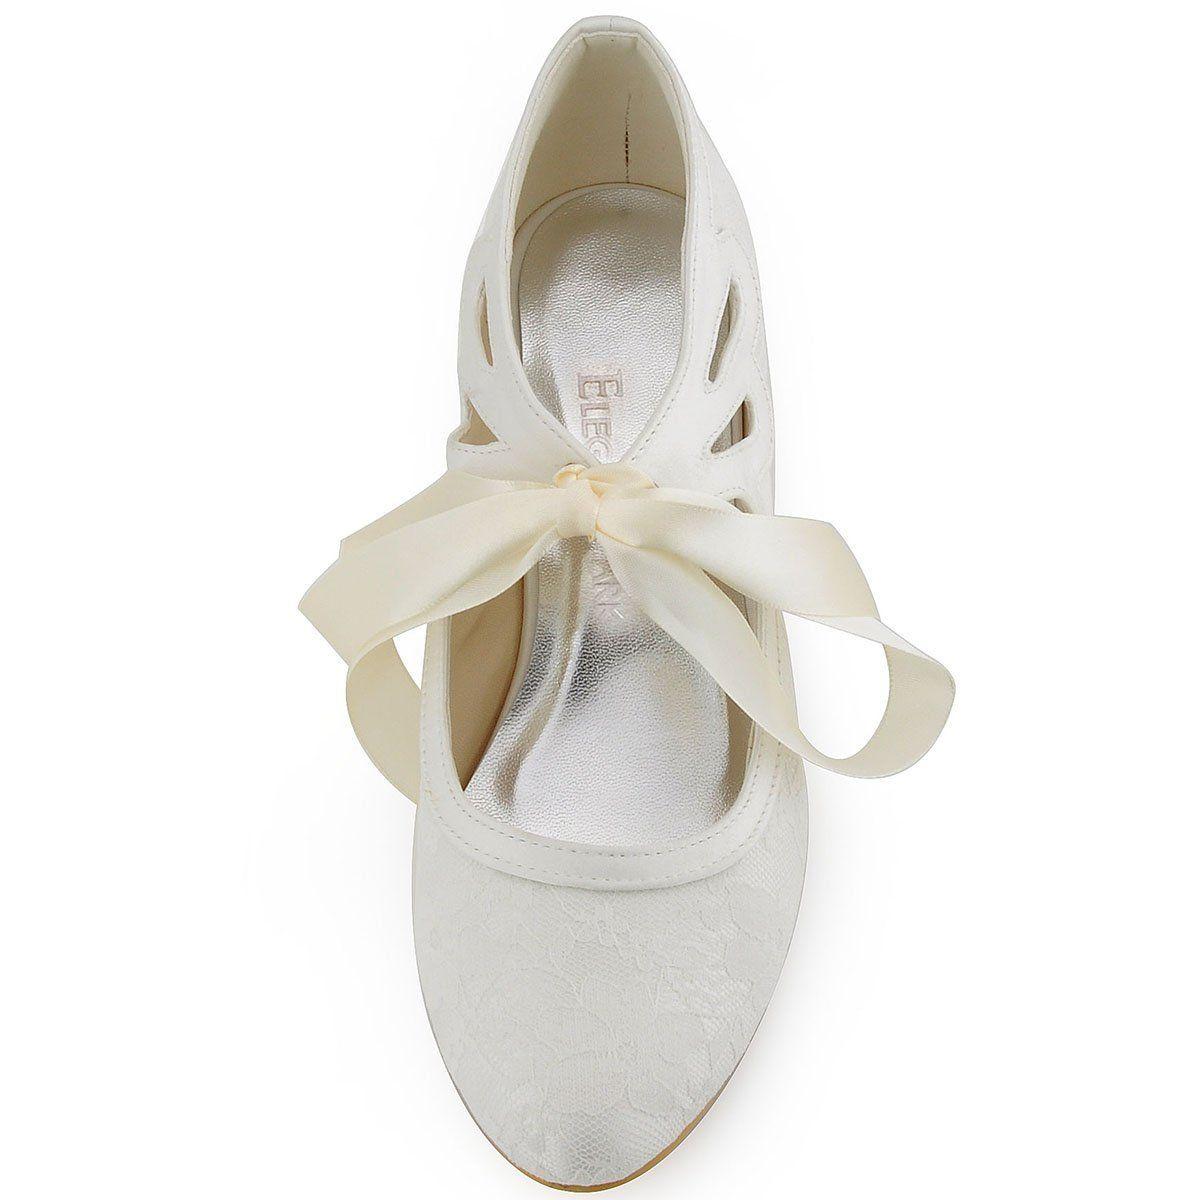 Low heel dress shoes for wedding  Amazon  ElegantPark HC Womenus Mary Jane Closed Toe Low